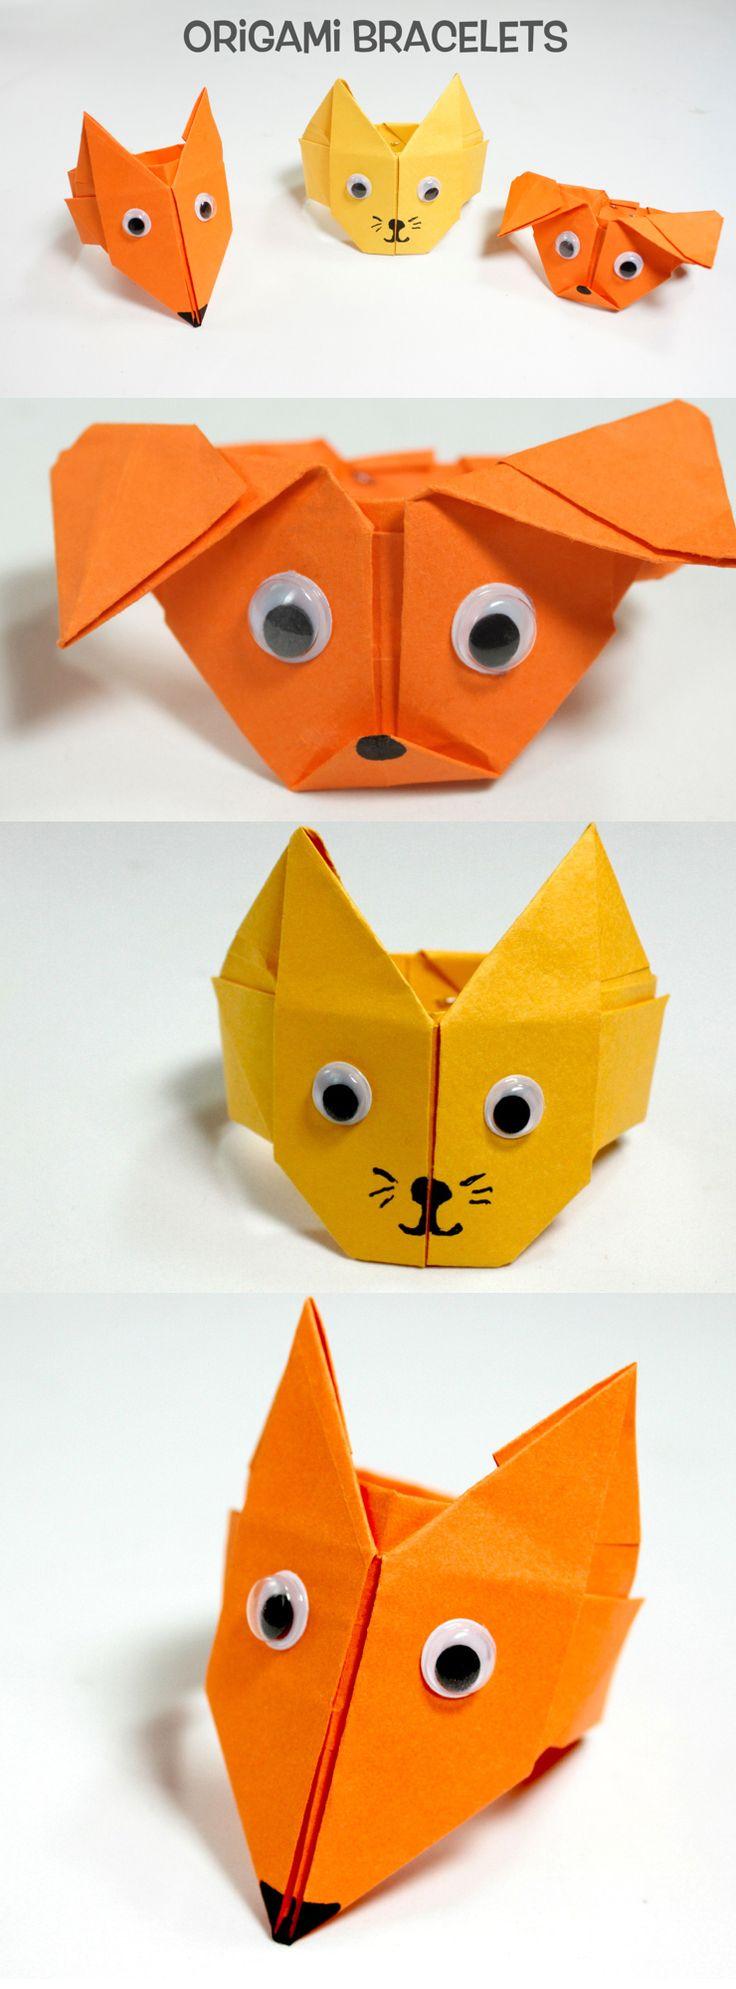 Origami Bracelets